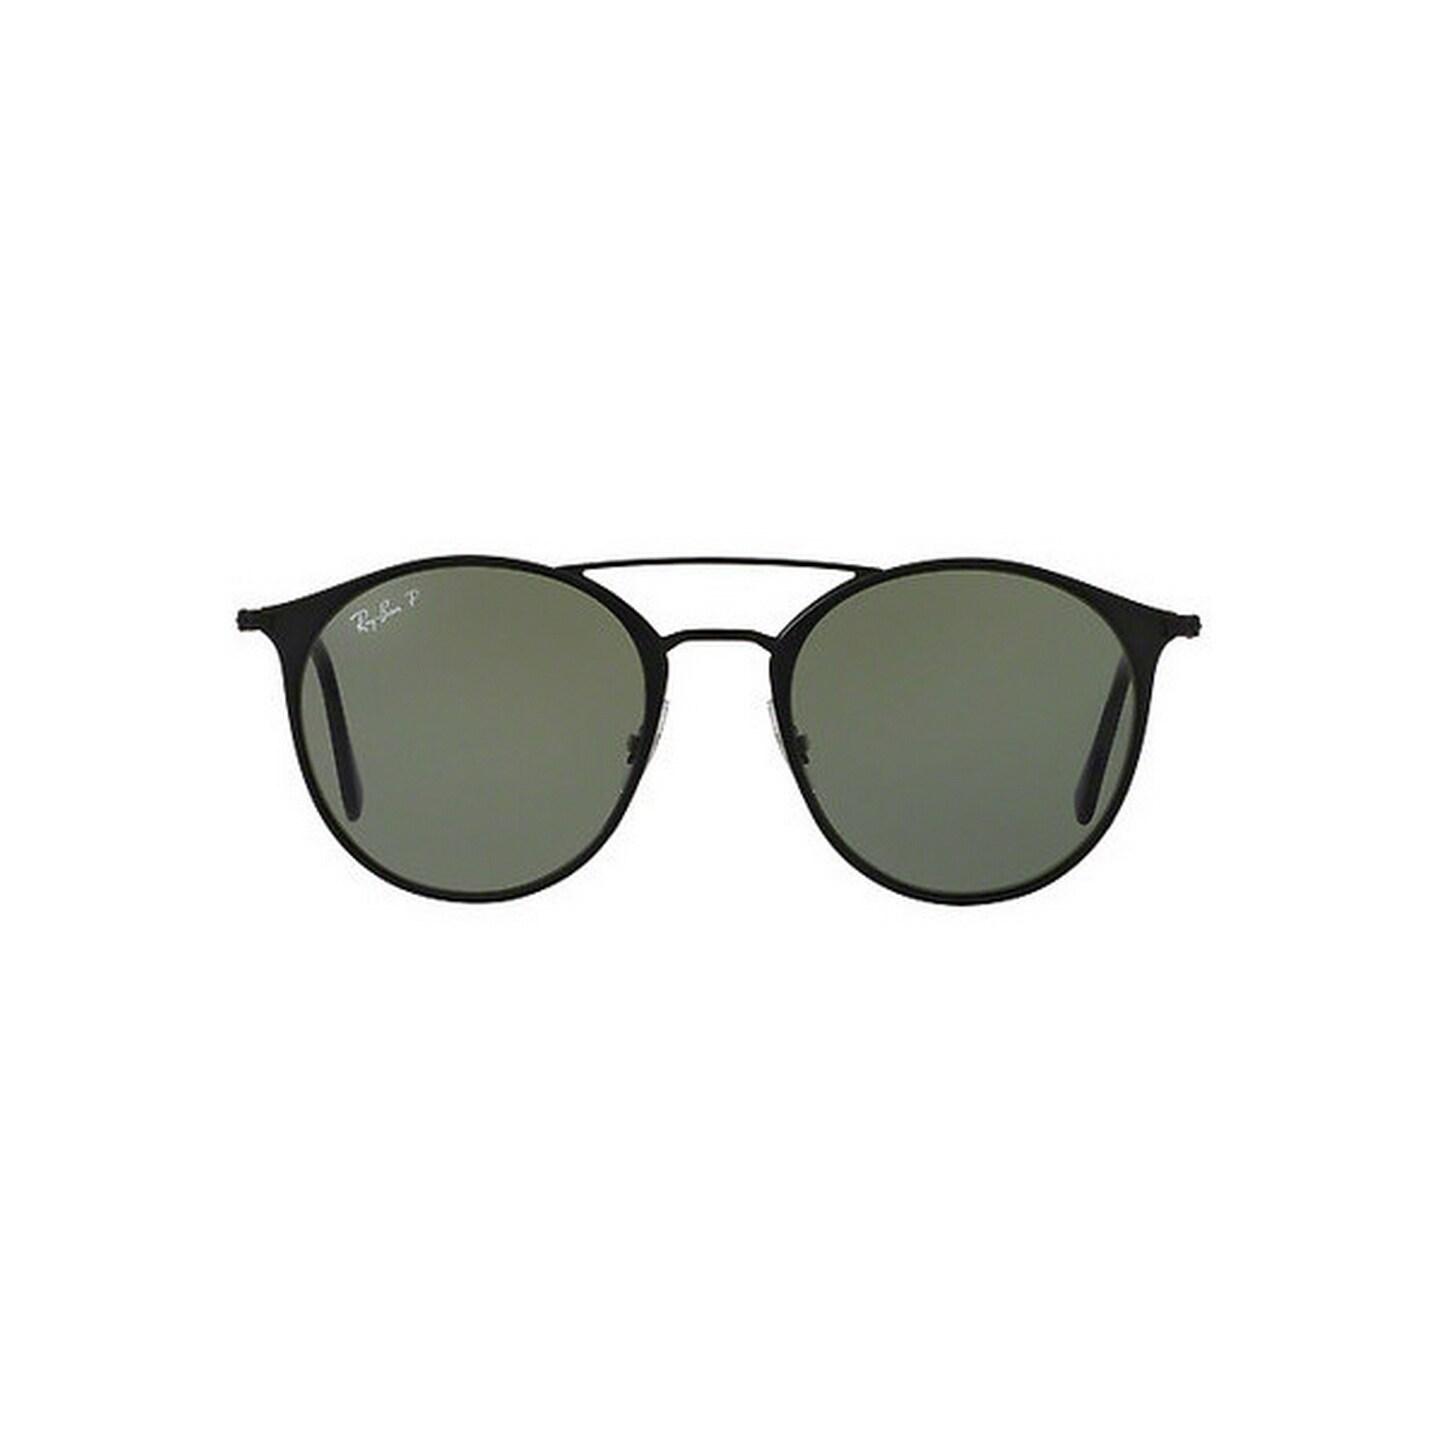 cb9e177c3fc Ray-Ban Unisex RB3546 186 9A 49 Round Metal Plastic Green Sunglasses